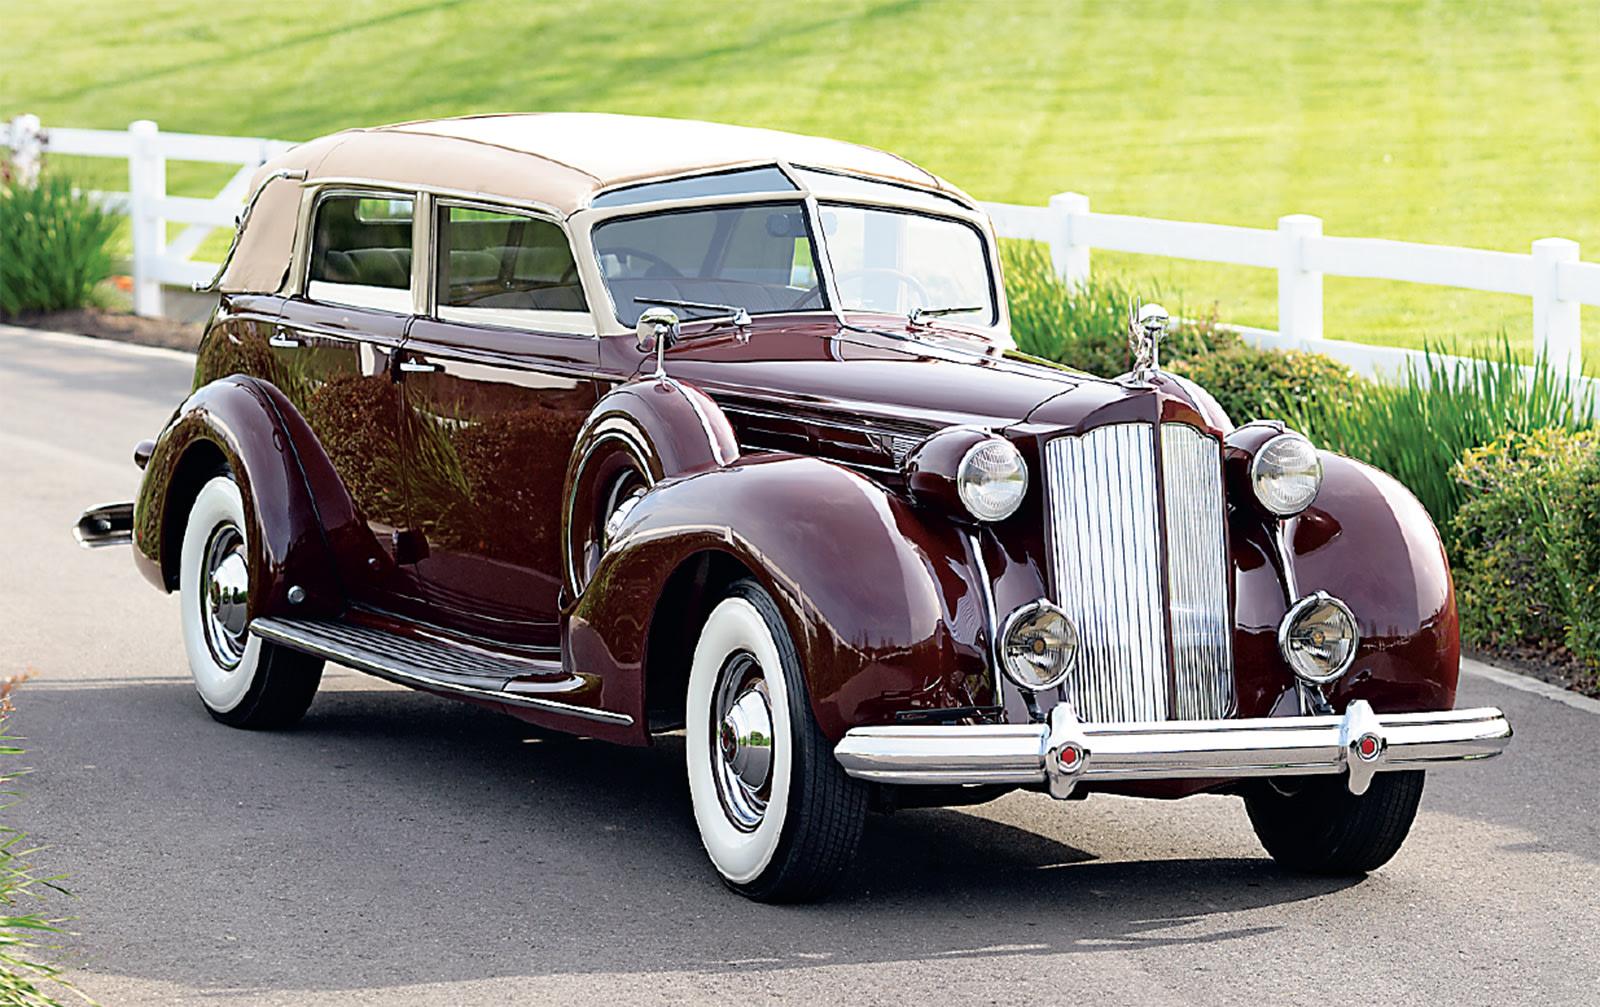 1938 Packard V-12 Brunn Touring Cabriolet